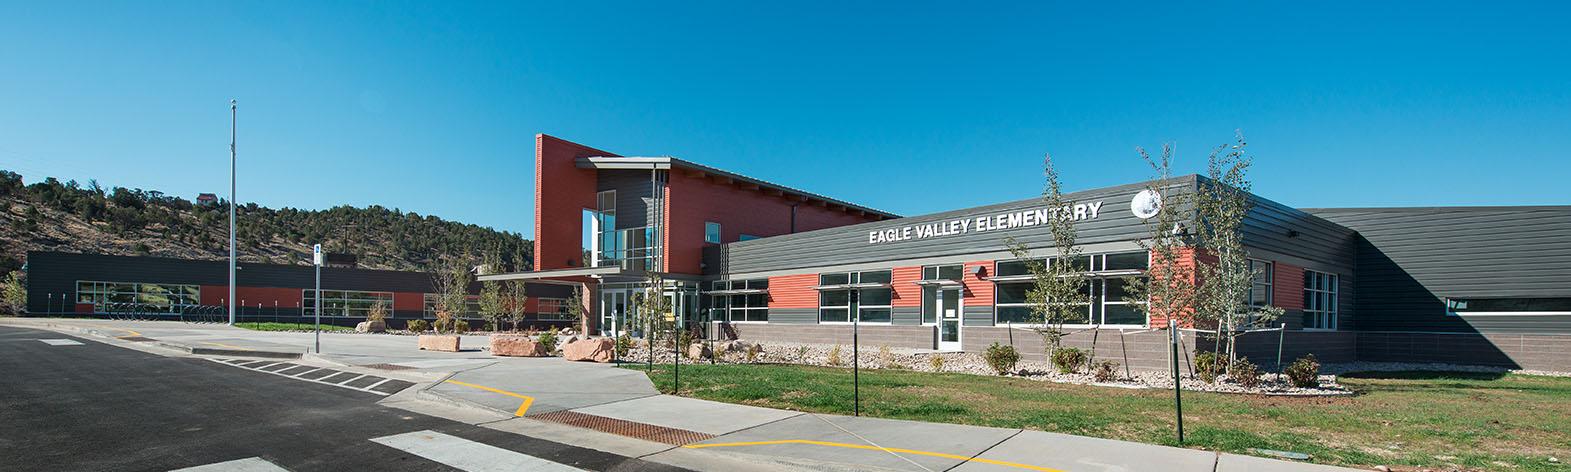 Eagle Valley Elementary School